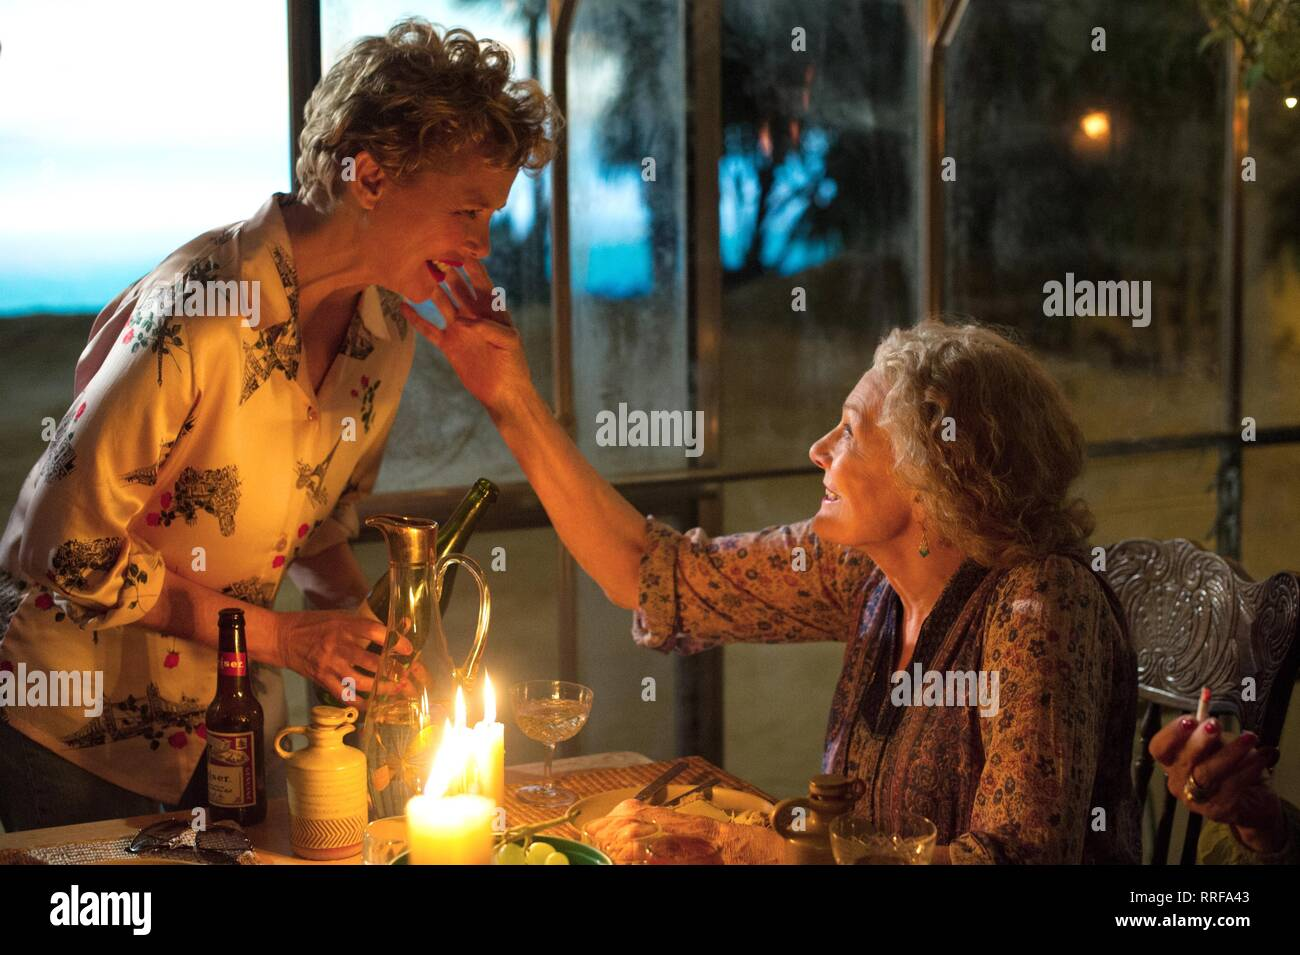 FILM STARS DON'T DIE IN LIVERPOOL, ANNETTE BENING , VANESSA REDGRAVE, 2017 - Stock Image